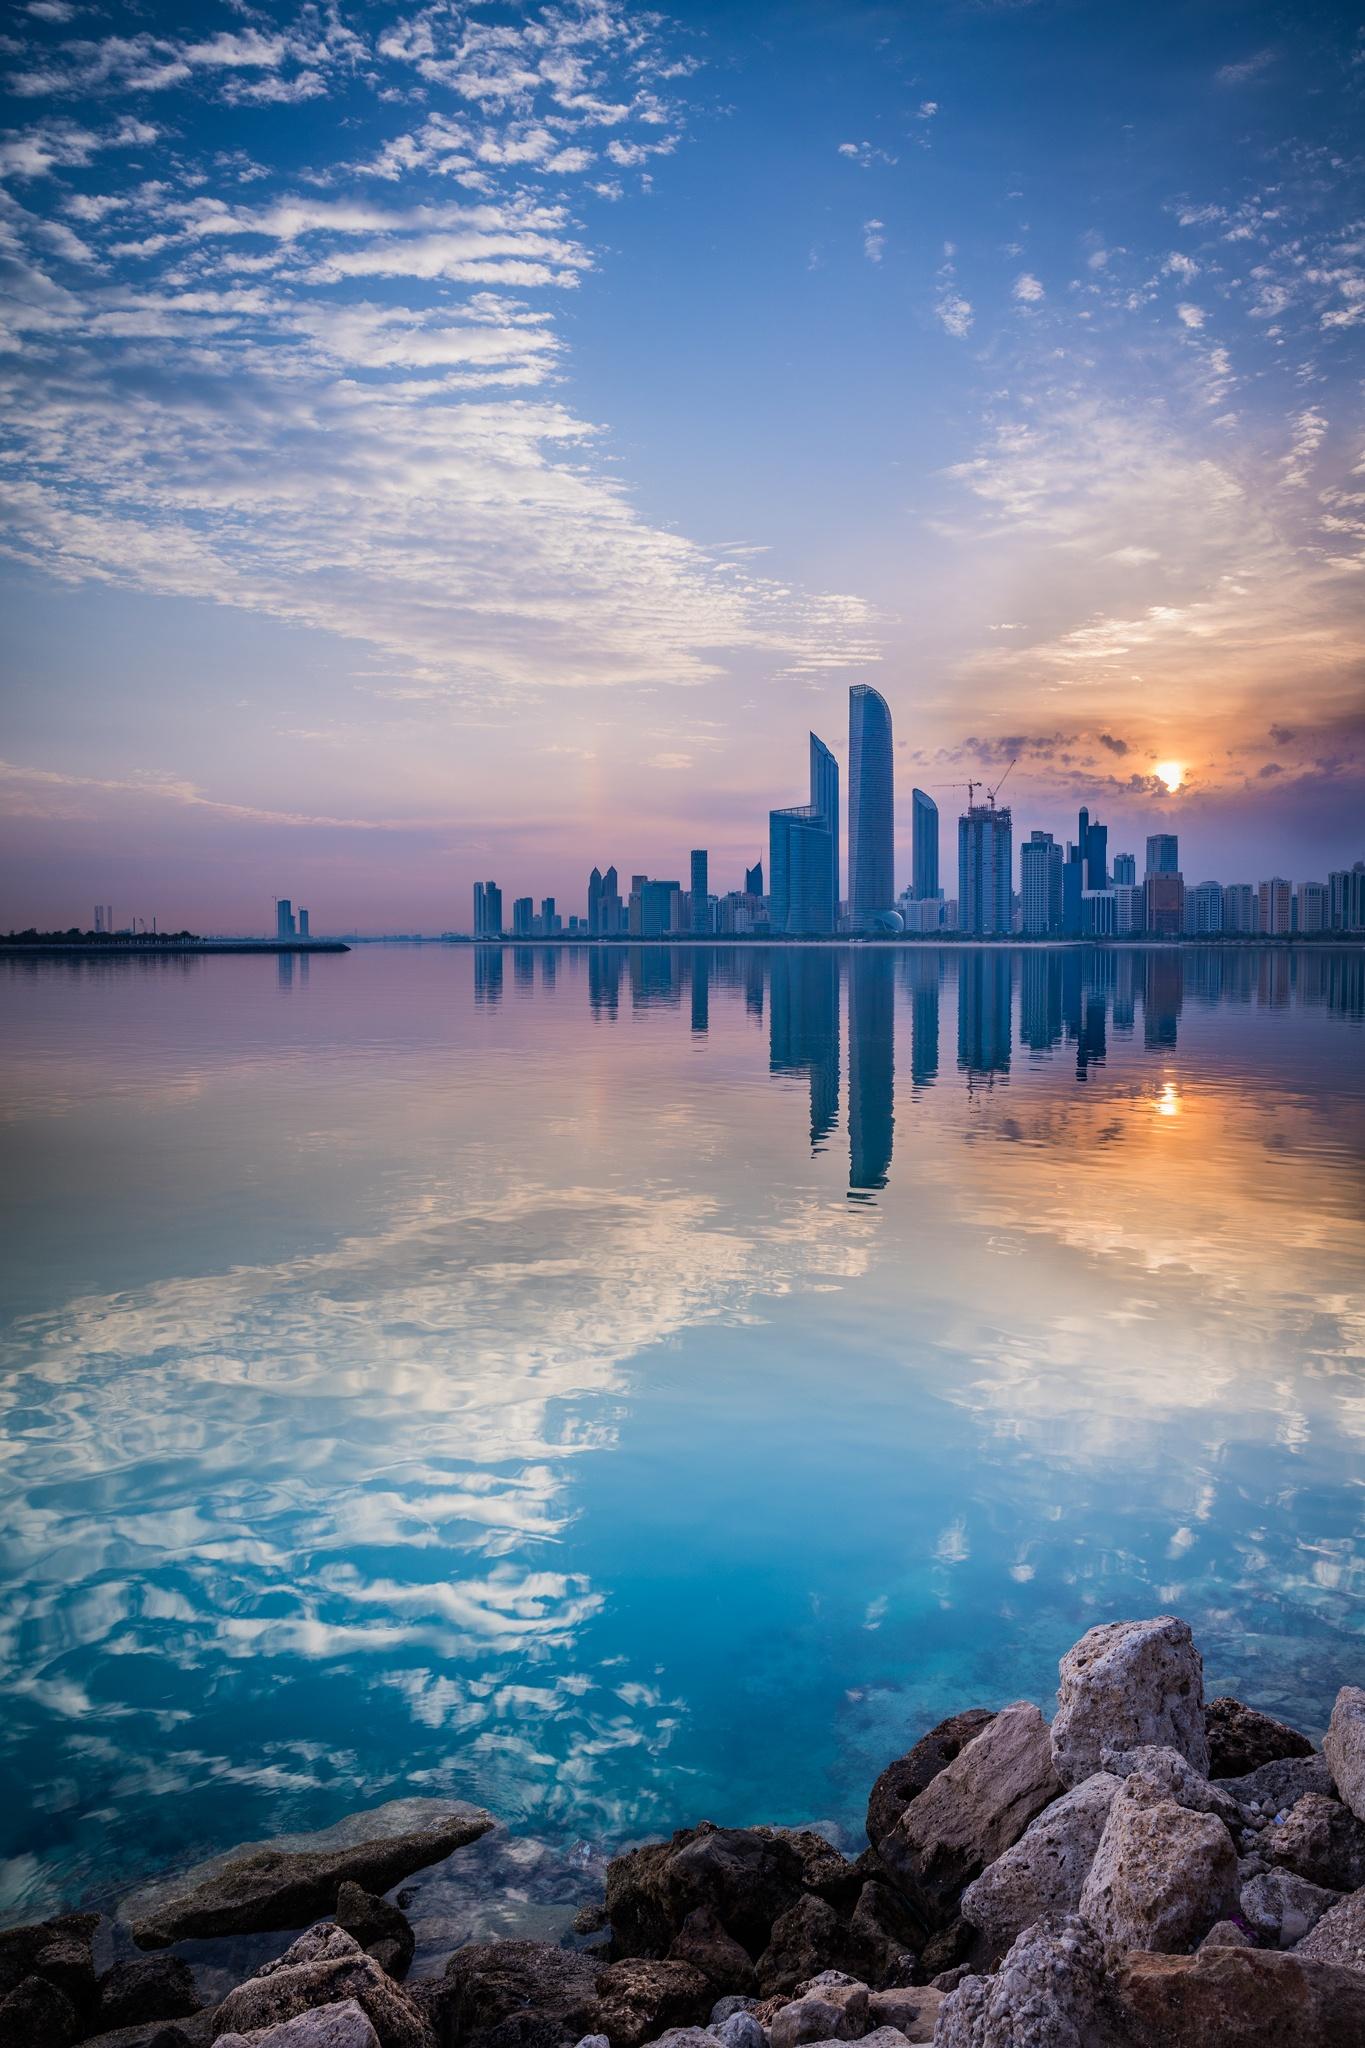 Reflection of Abu Dhabi by Murshed AlMehairi